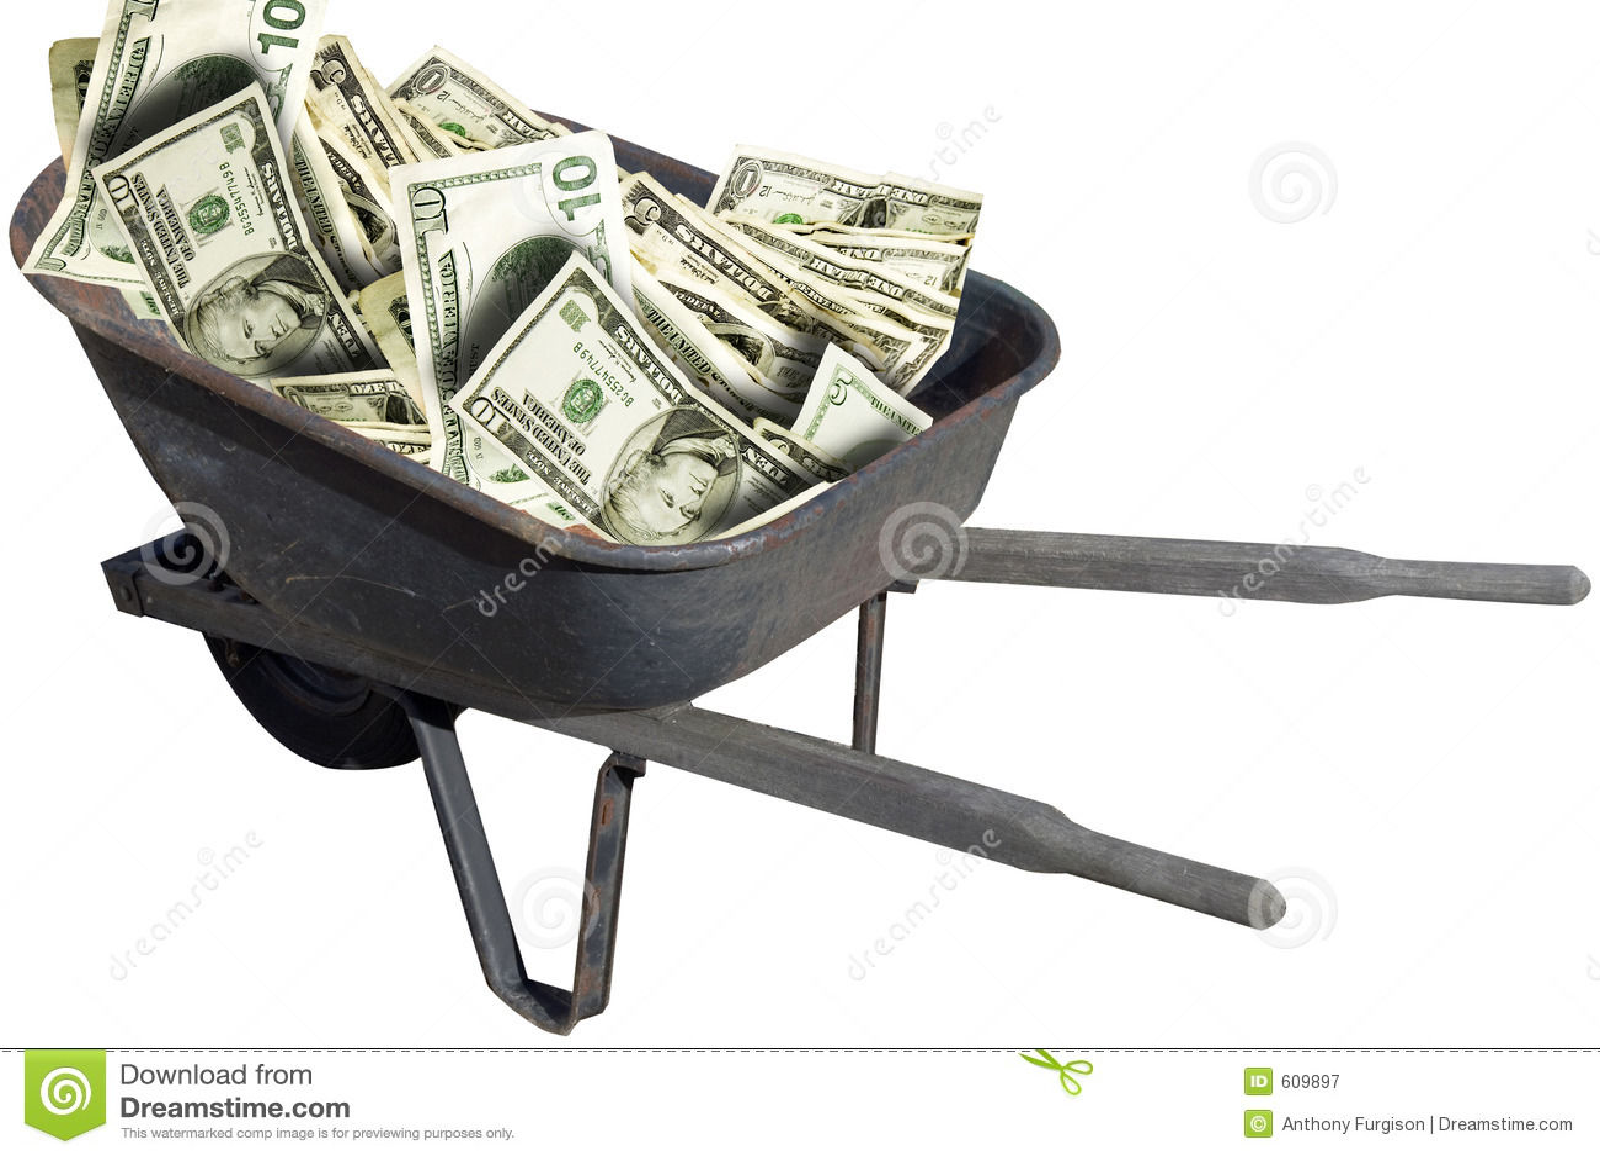 Fully Cashable Deposit - 144287